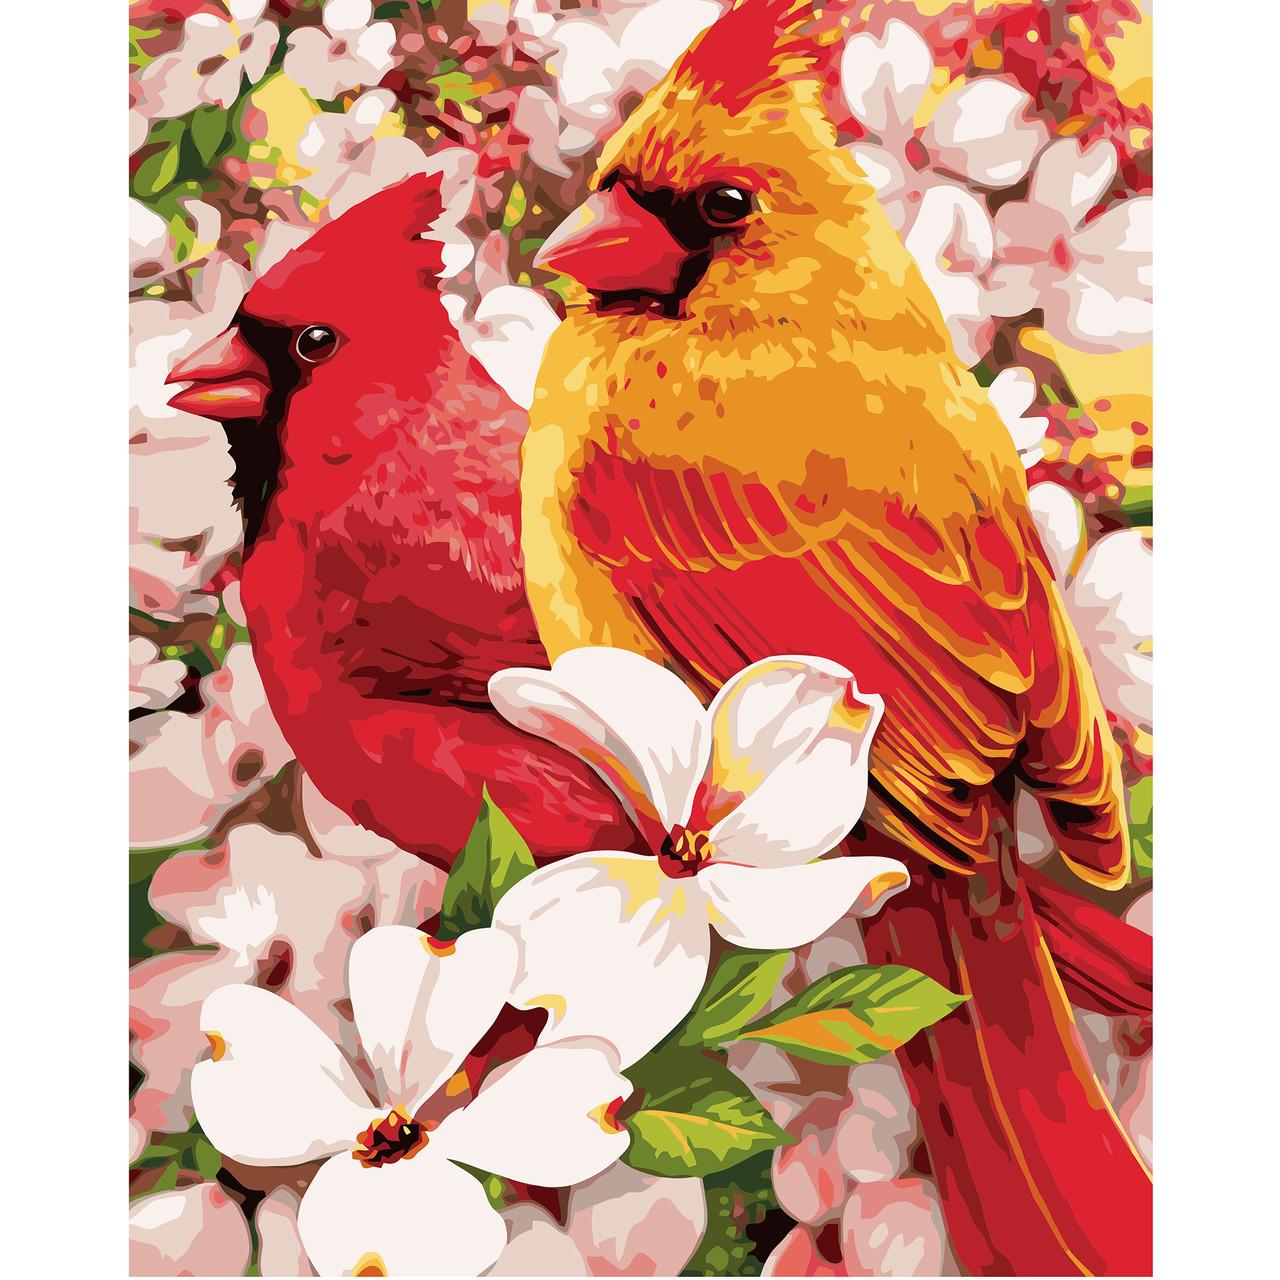 Картина по номерам VA-0922 Птицы в цветах, 40х50 см Strateg